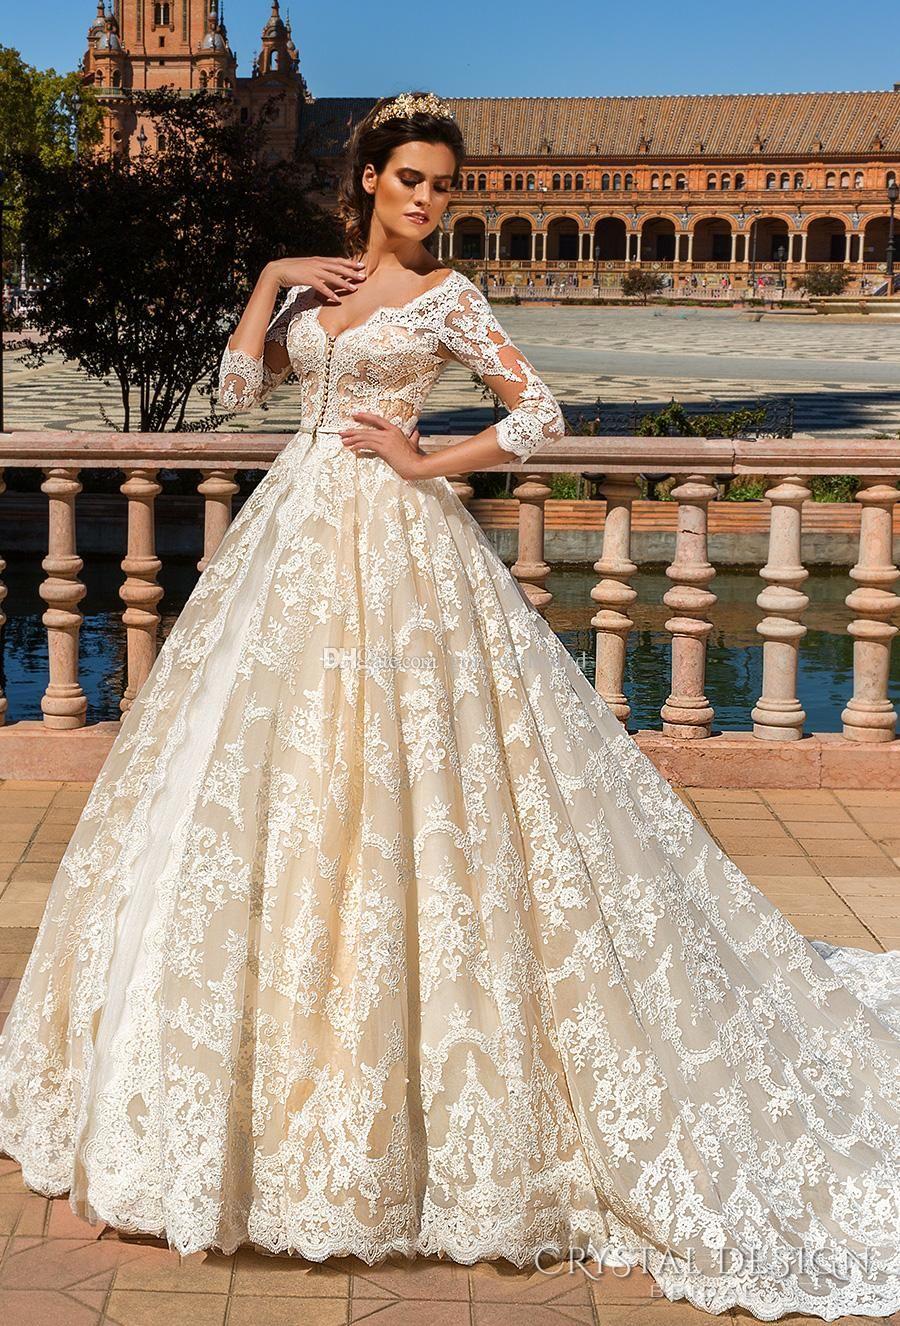 Princess Ball Gown Wedding Dresses 2017 Crystal Design Bridal ...